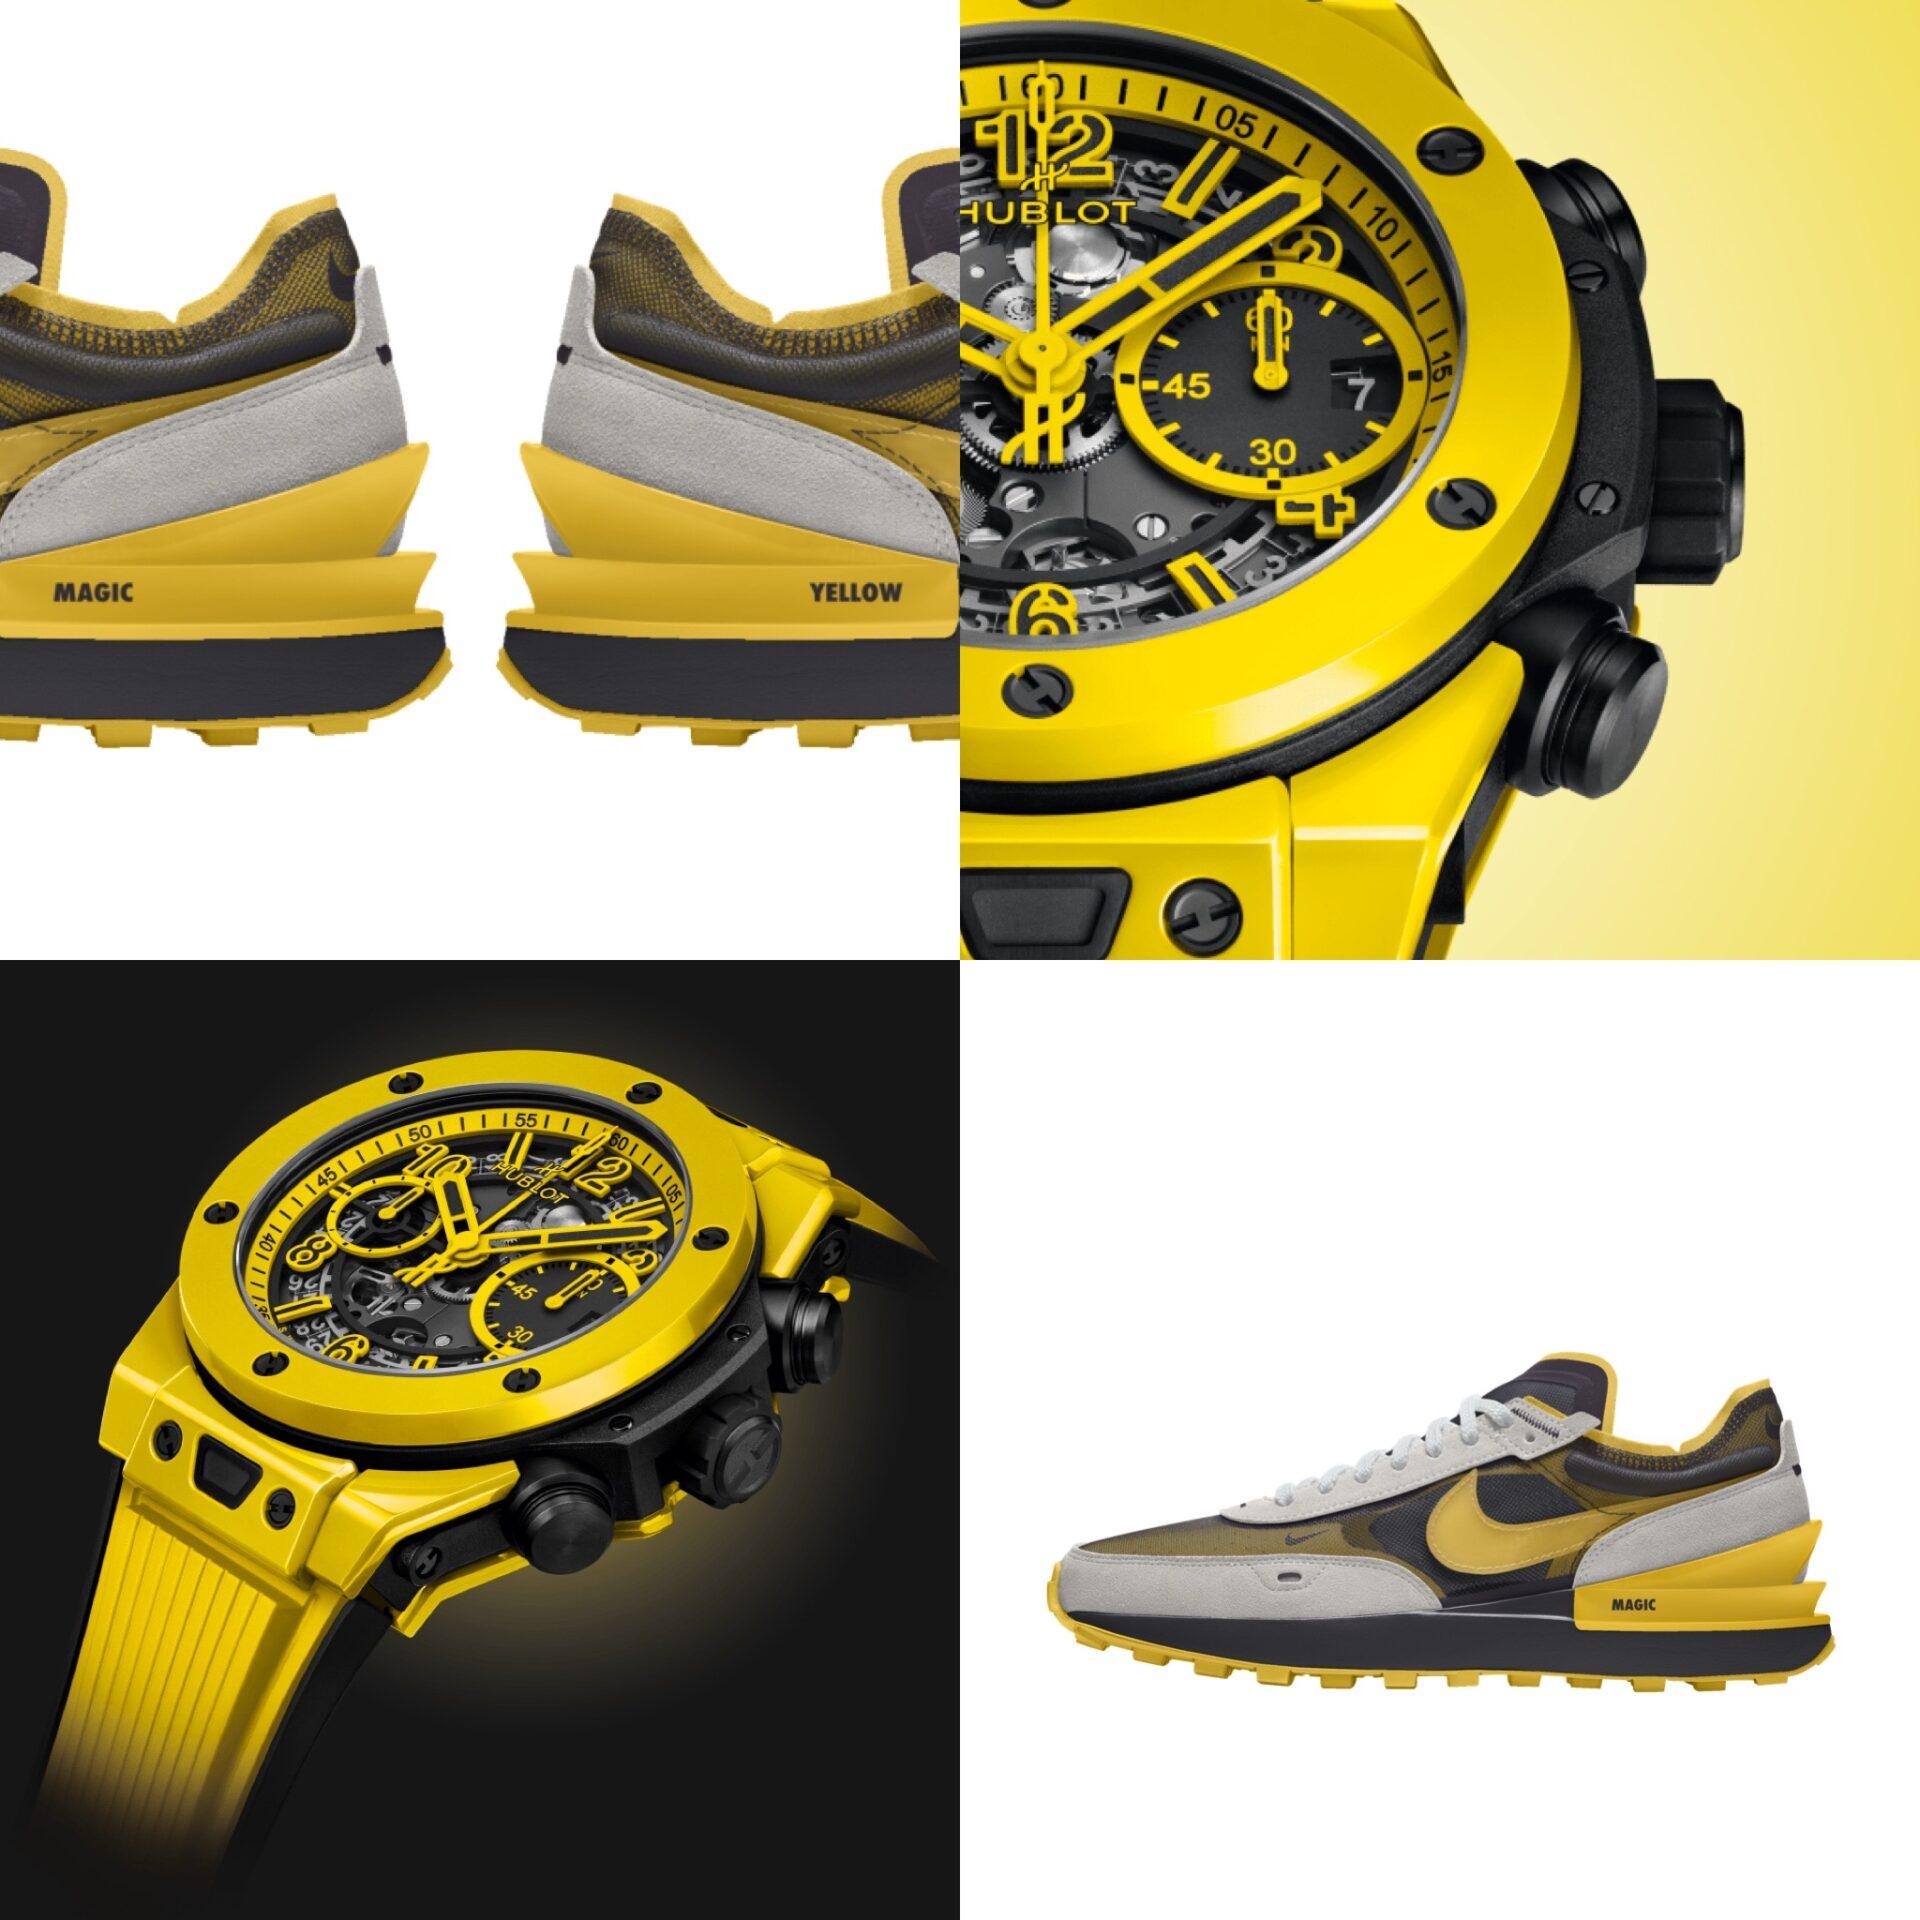 #Kixntix: The Hublot Big Bang Unico Yellow Magic is cool enough to warrant its own bespoke sneaker